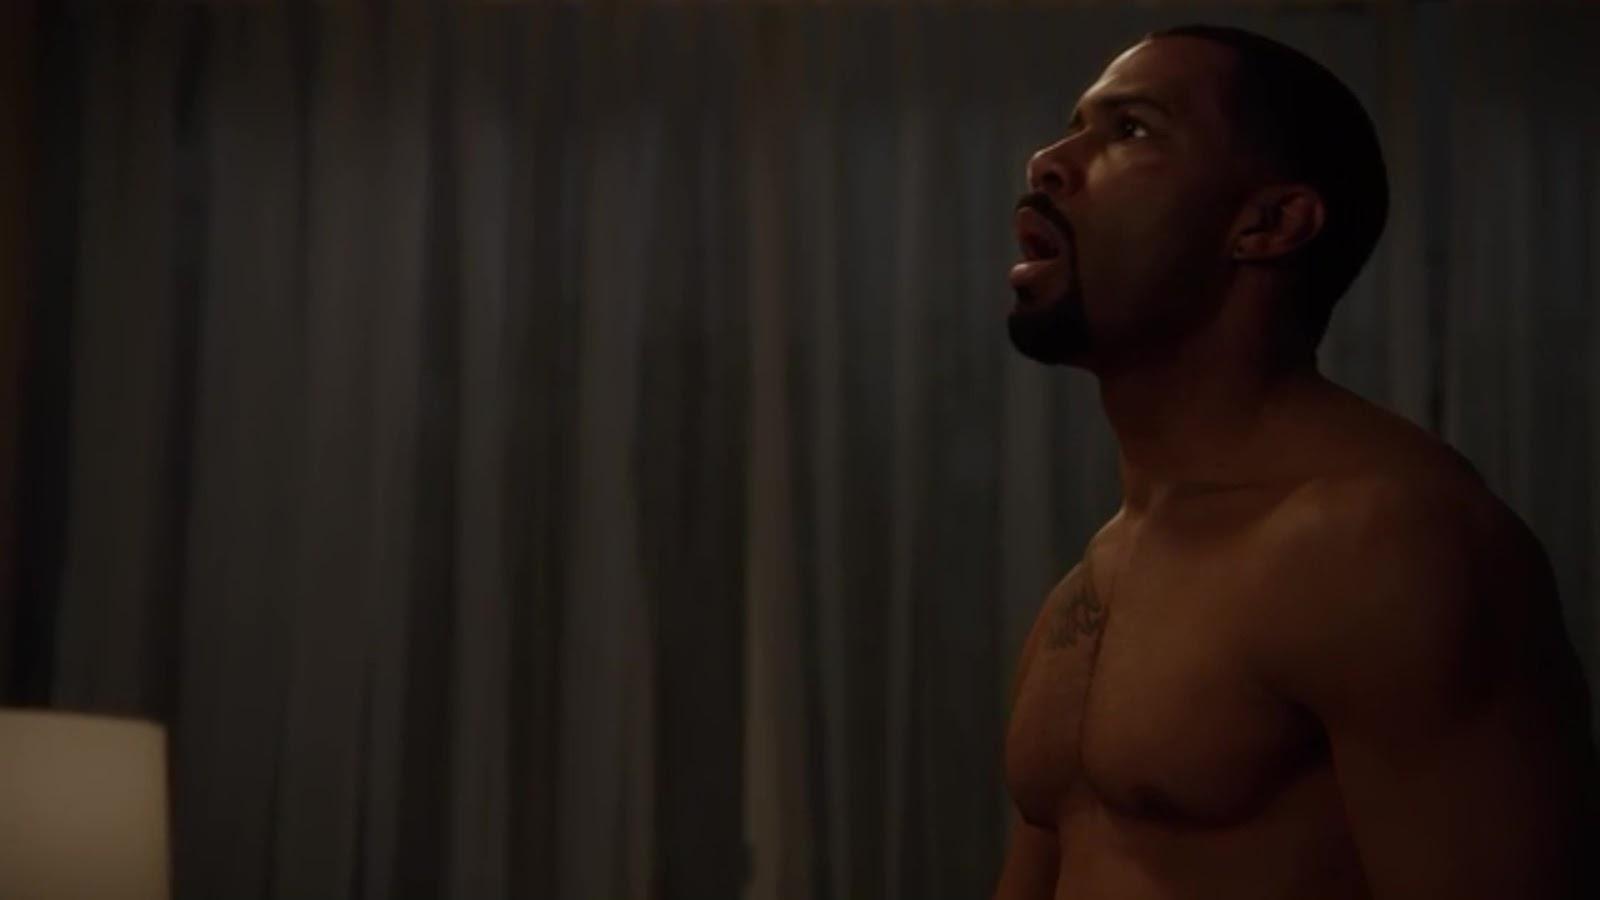 Auscaps Omari Hardwick Nude In Power 1-02 -4365